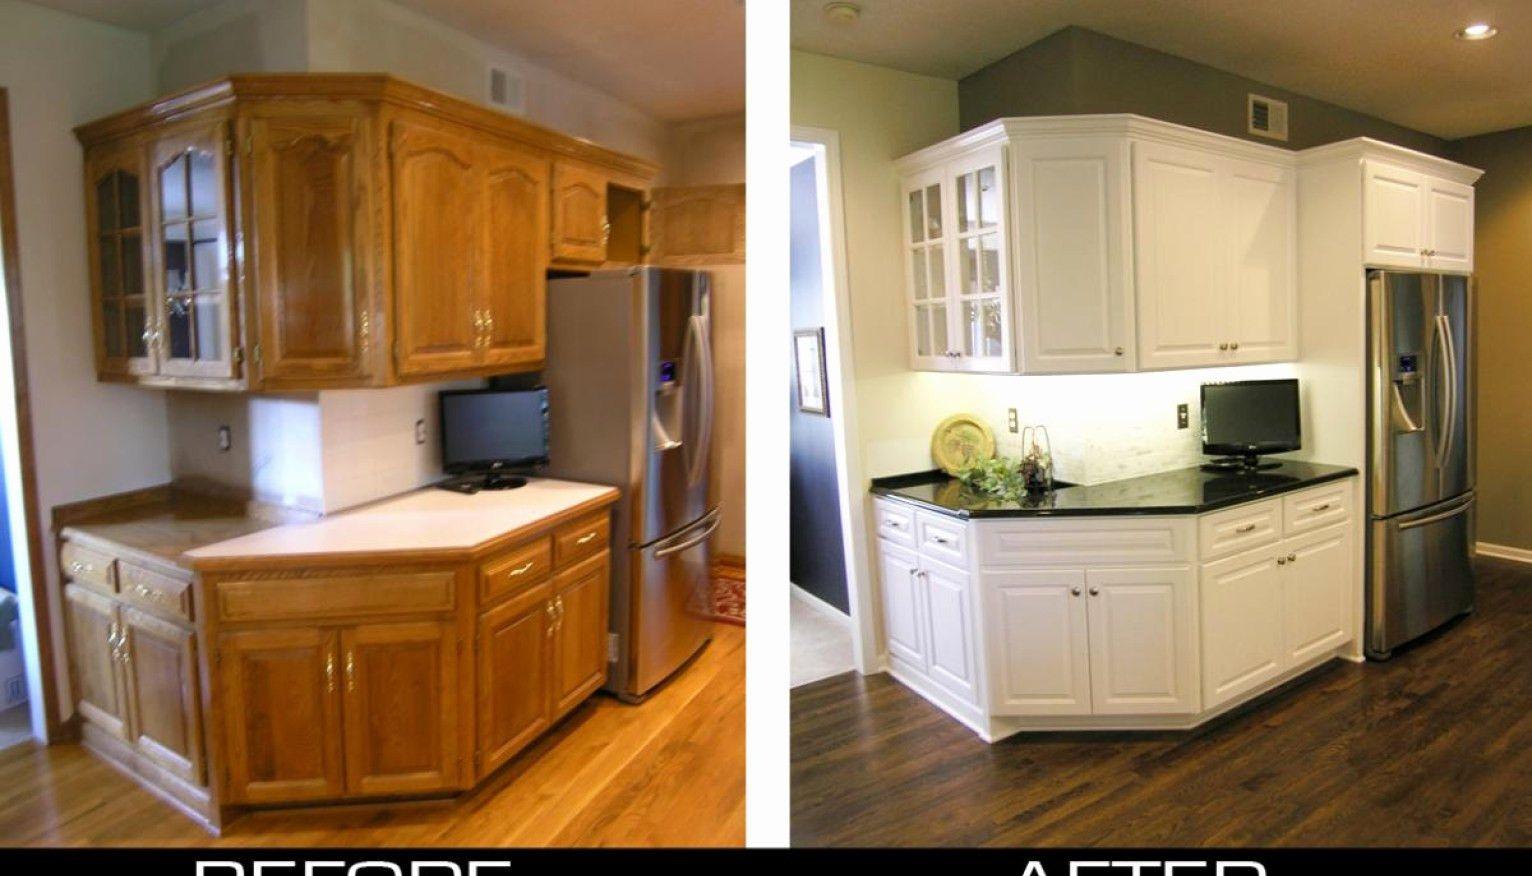 50 How To Refinish Oak Kitchen Cabinets Kitchen Cabinet Lighting Ideas Www Planetgreens Refinish Kitchen Cabinets Kitchen Refinishing Refinishing Cabinets